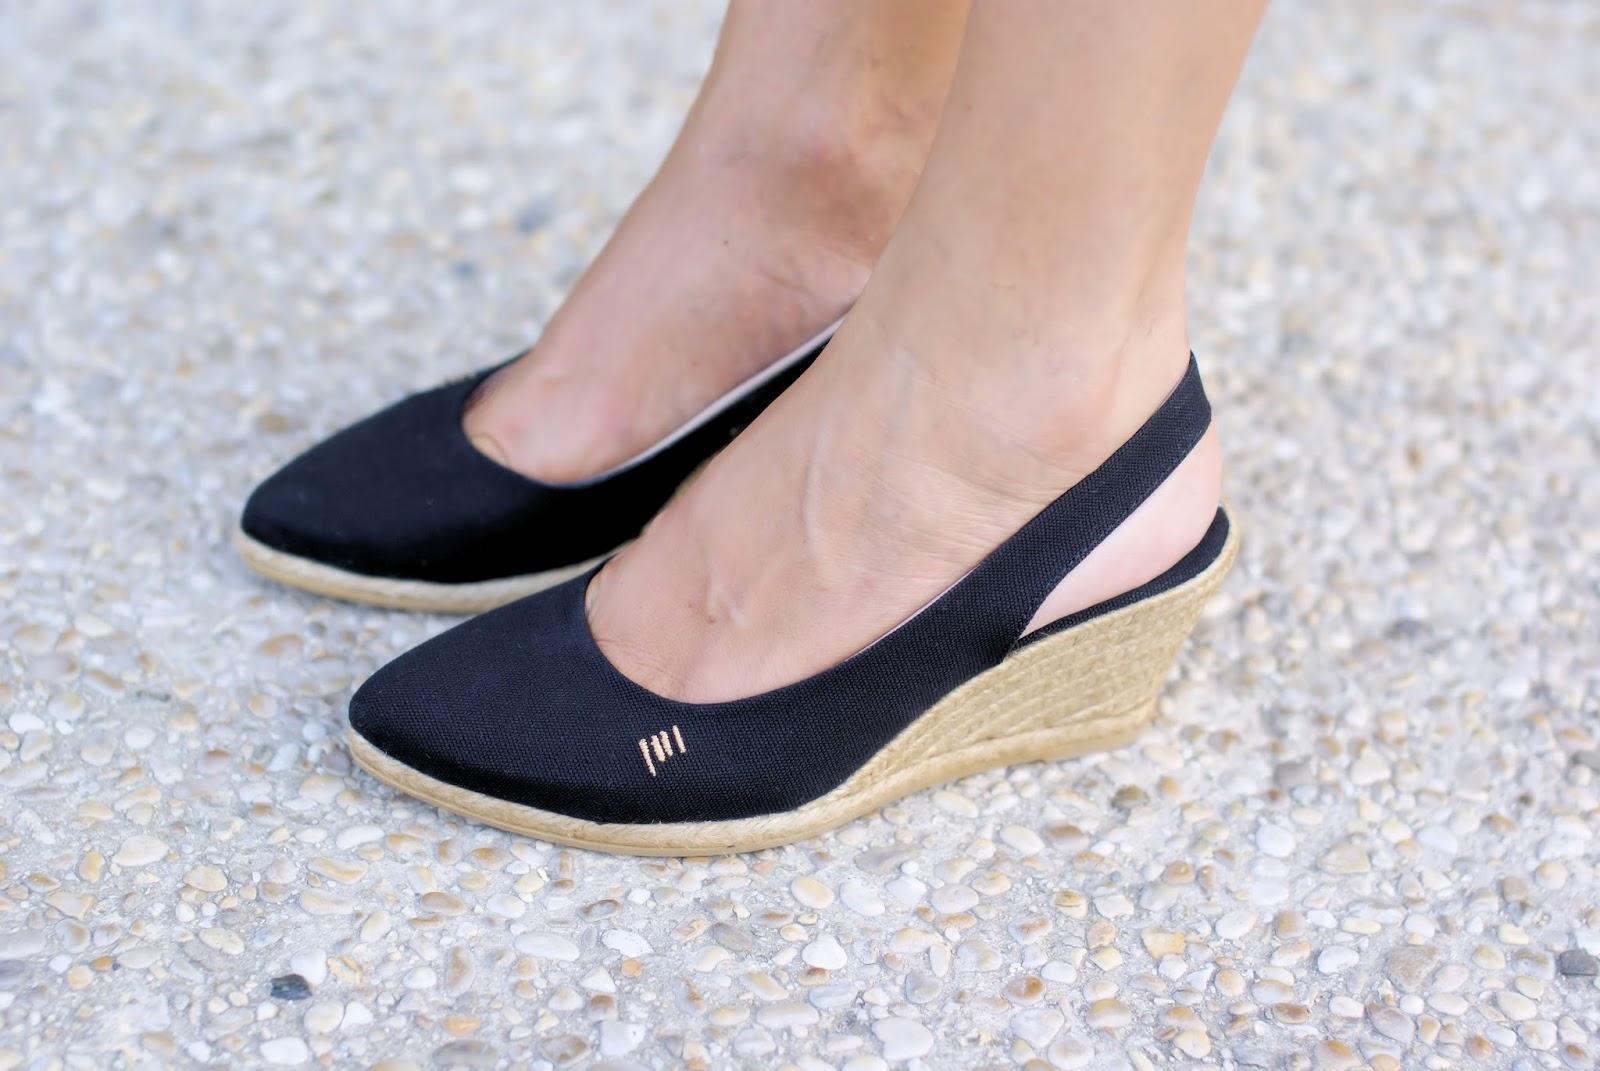 Viscata wedge Lloret espadrillas on Fashion and Cookies fashion blog, fashion blogger